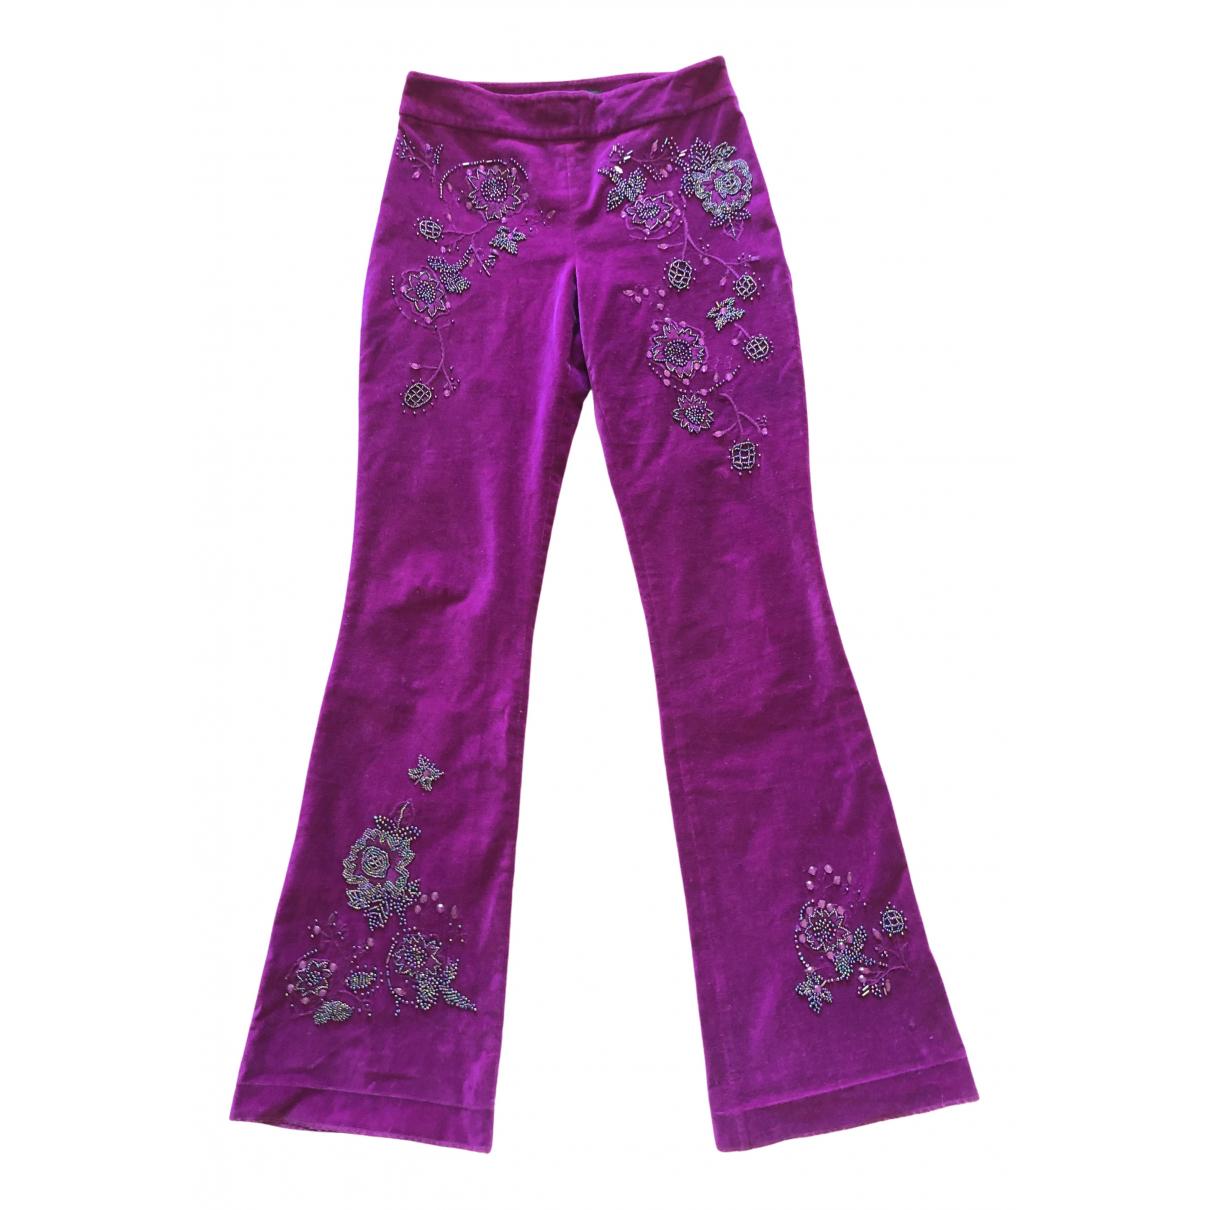 Karen Millen N Purple Cotton Trousers for Women 10 UK